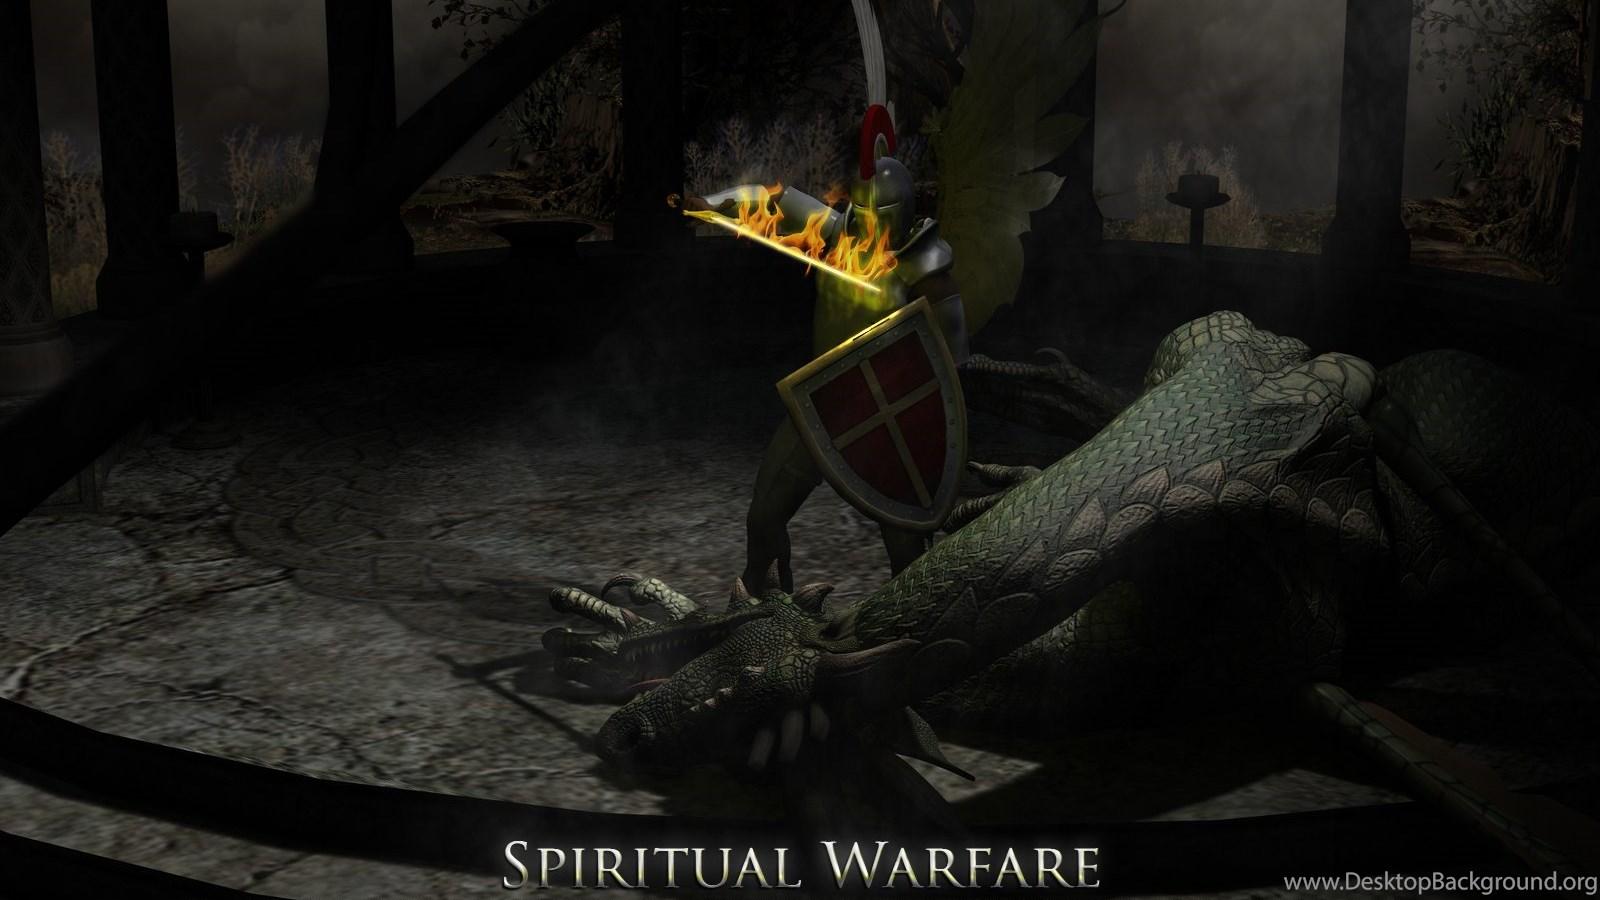 Wallpapers The Shield Spiritual Warfare Realistic Imaginations